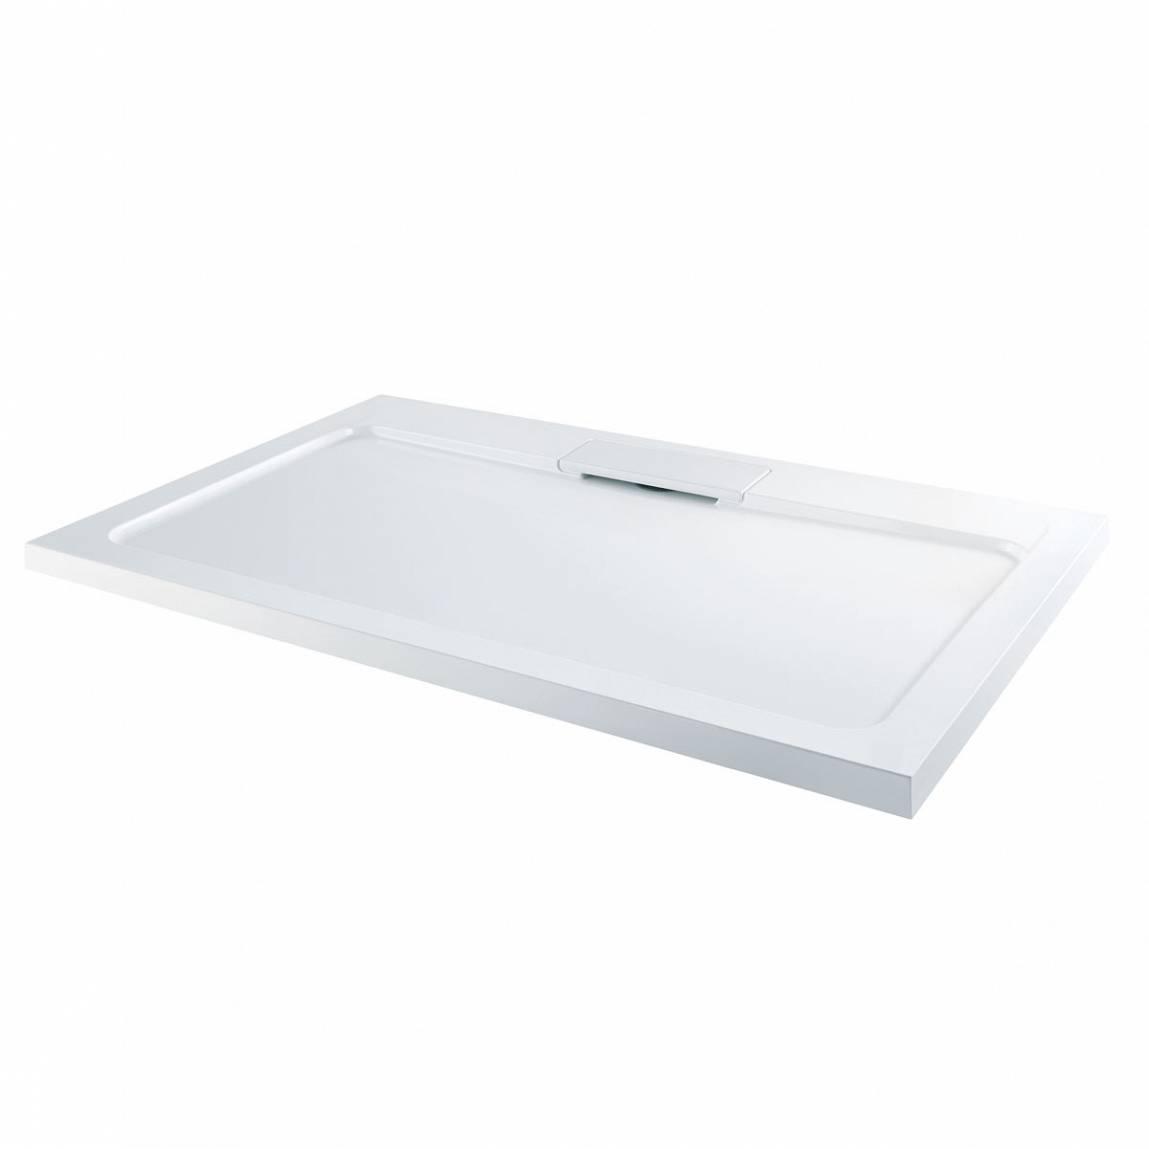 Image of Designer Rectangular Stone Shower Tray 1000 x 800